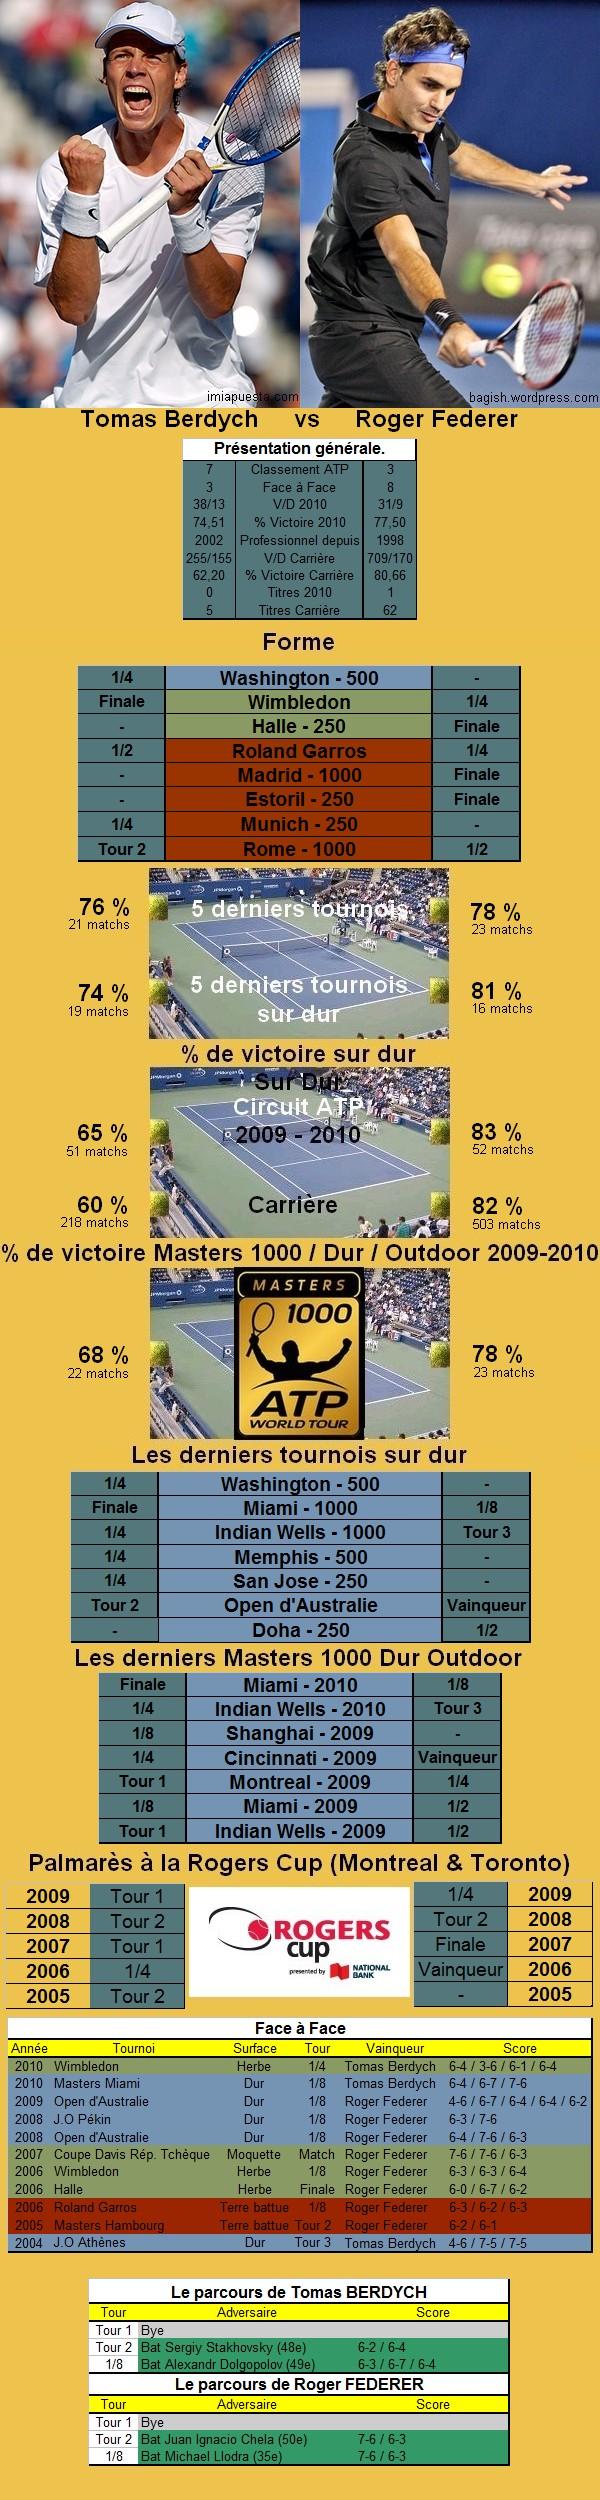 Statistiques tennis de Berdych contre Federer à Toronto